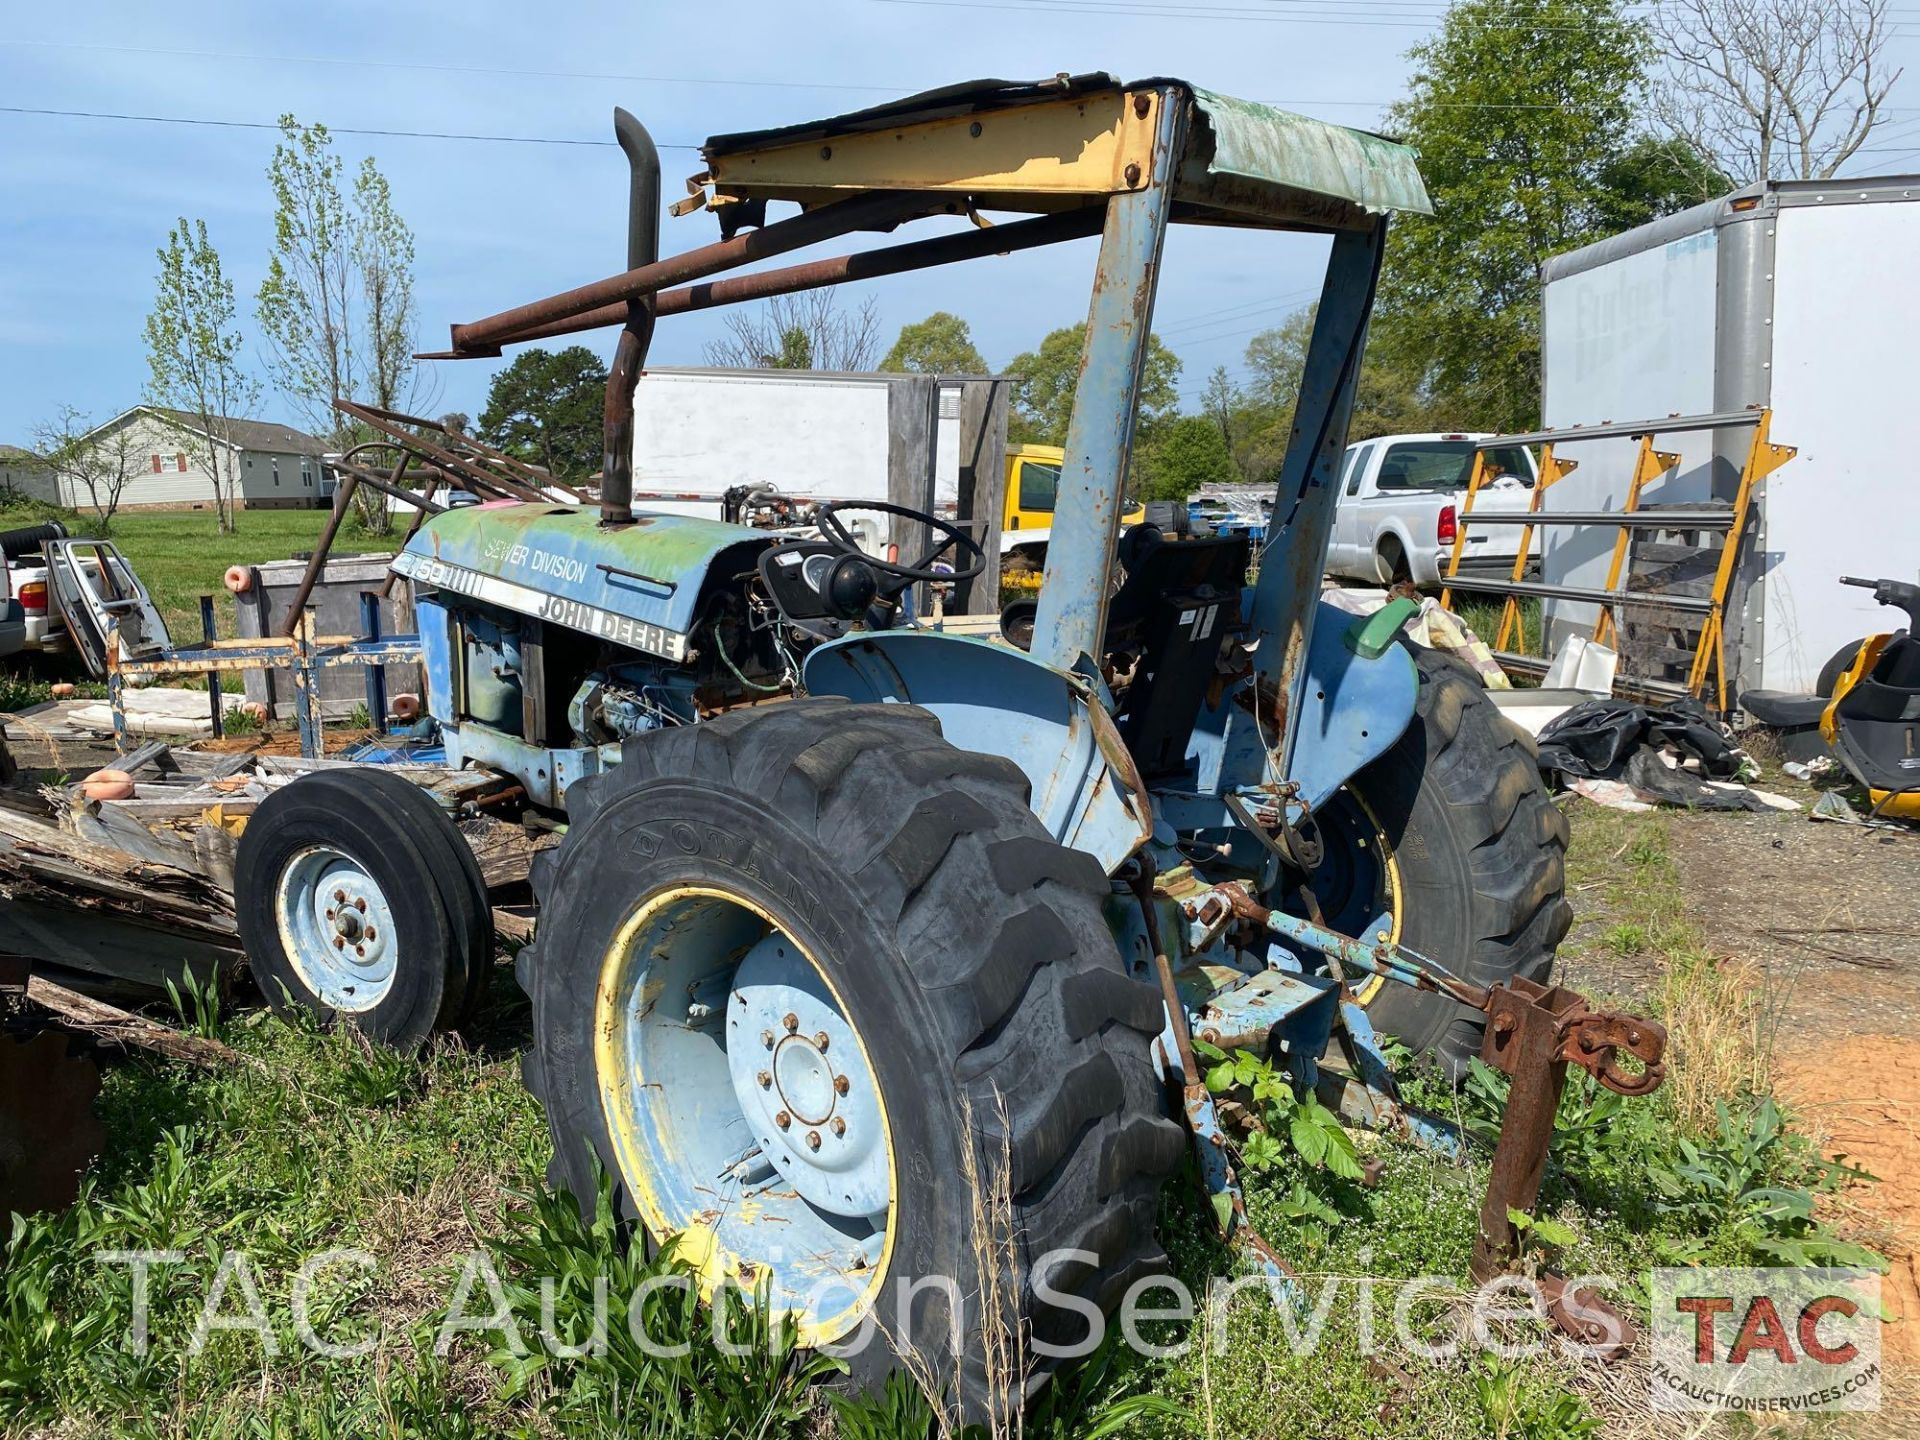 John Deere 2150 Farm Tractor - Image 5 of 34